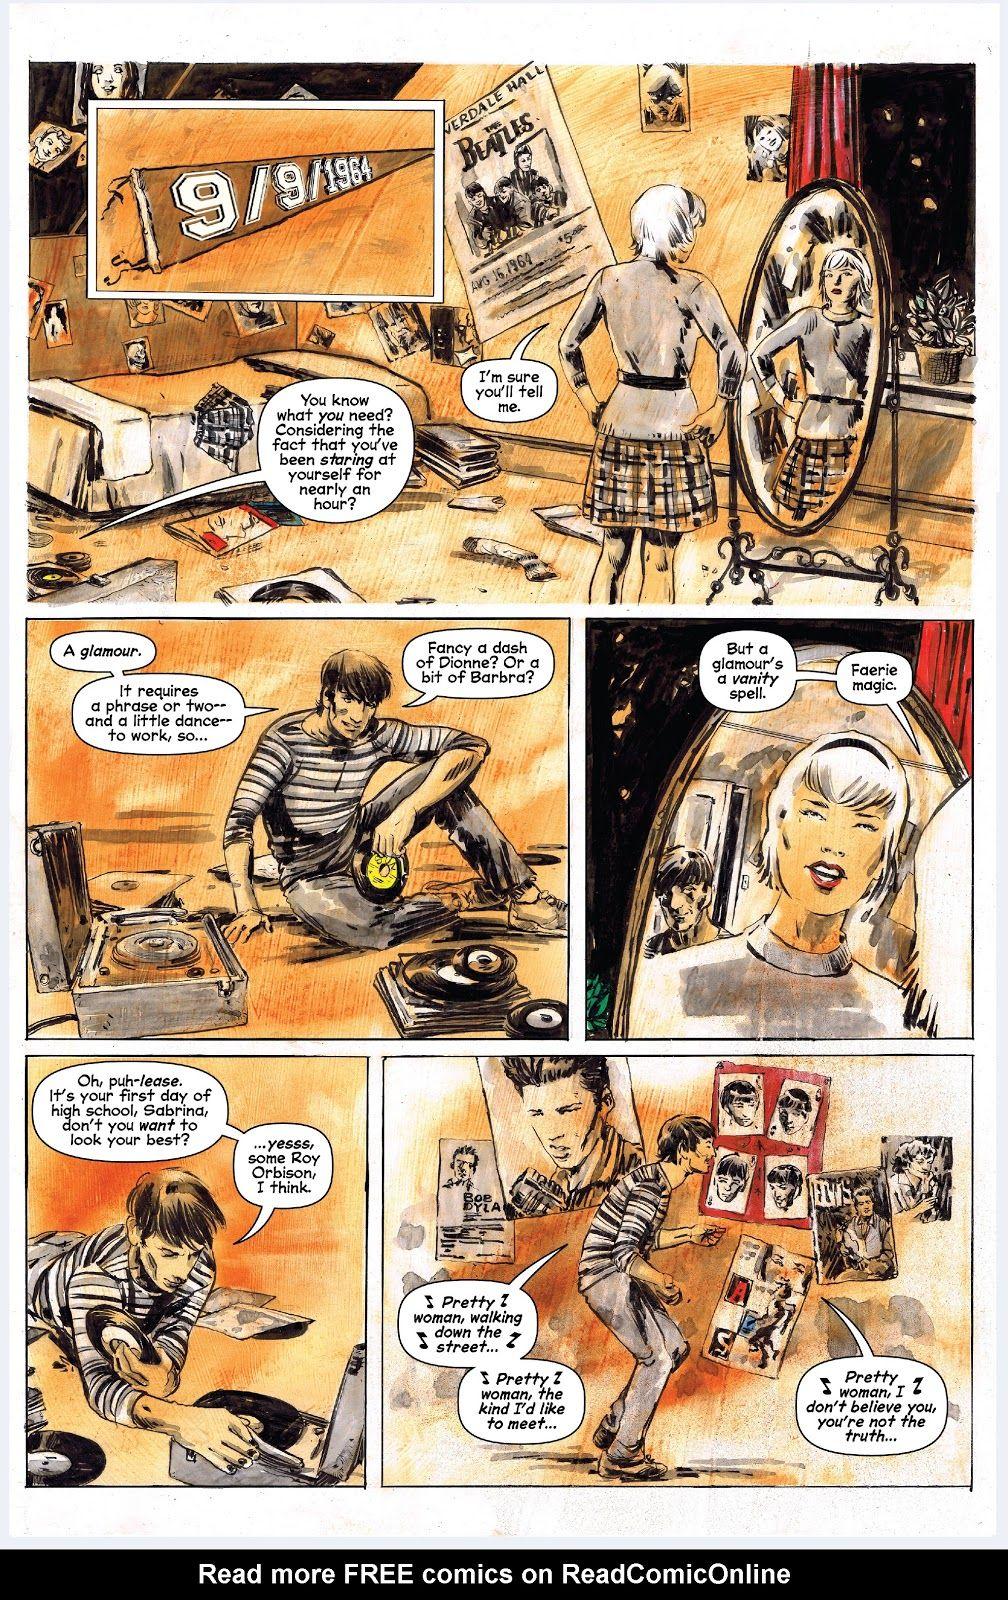 Chilling Adventures Of Sabrina Issue 1 Read Chilling Adventures Of Sabrina Issue 1 Comic Online In High Quality Sabrina Spellman Archie Comics Comics